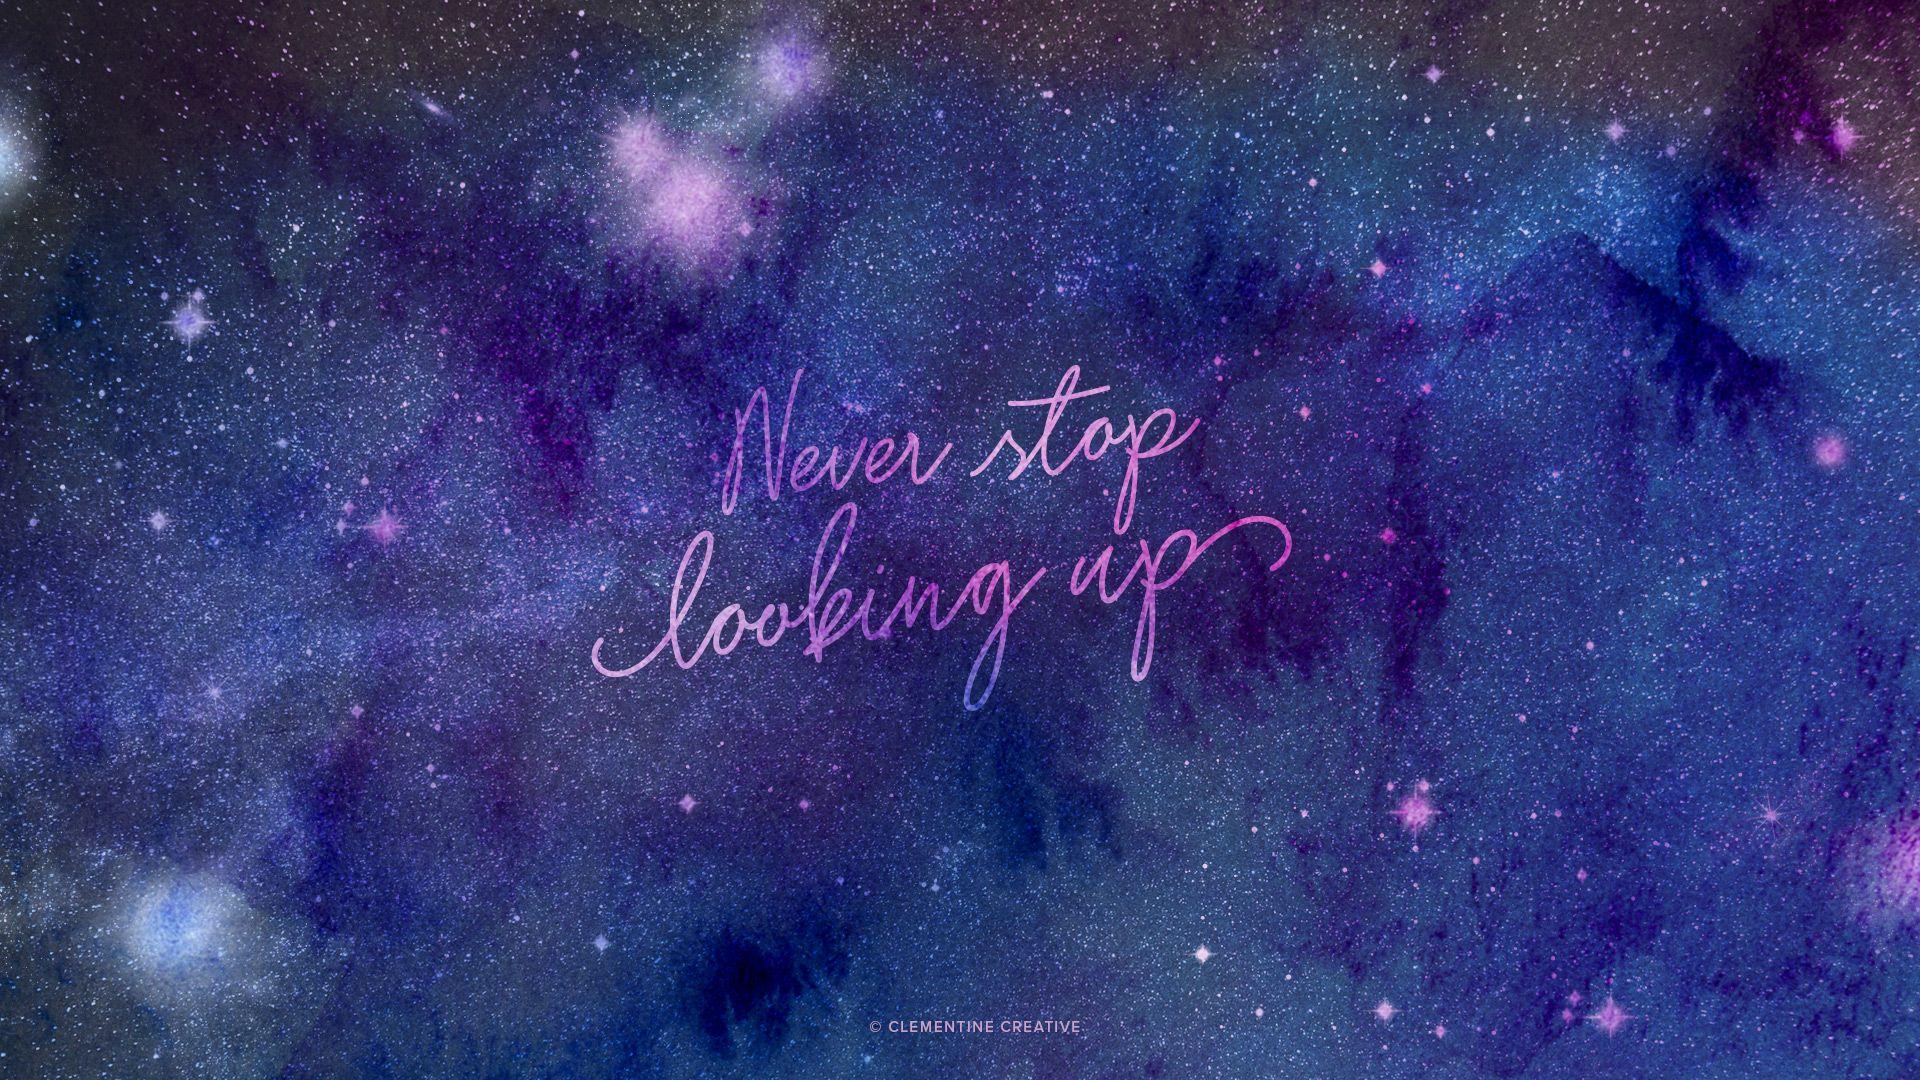 Star Quotes Wallpaper Laptop Google Search Cool Galaxy Wallpapers Galaxy Wallpaper Cute Tumblr Wallpaper